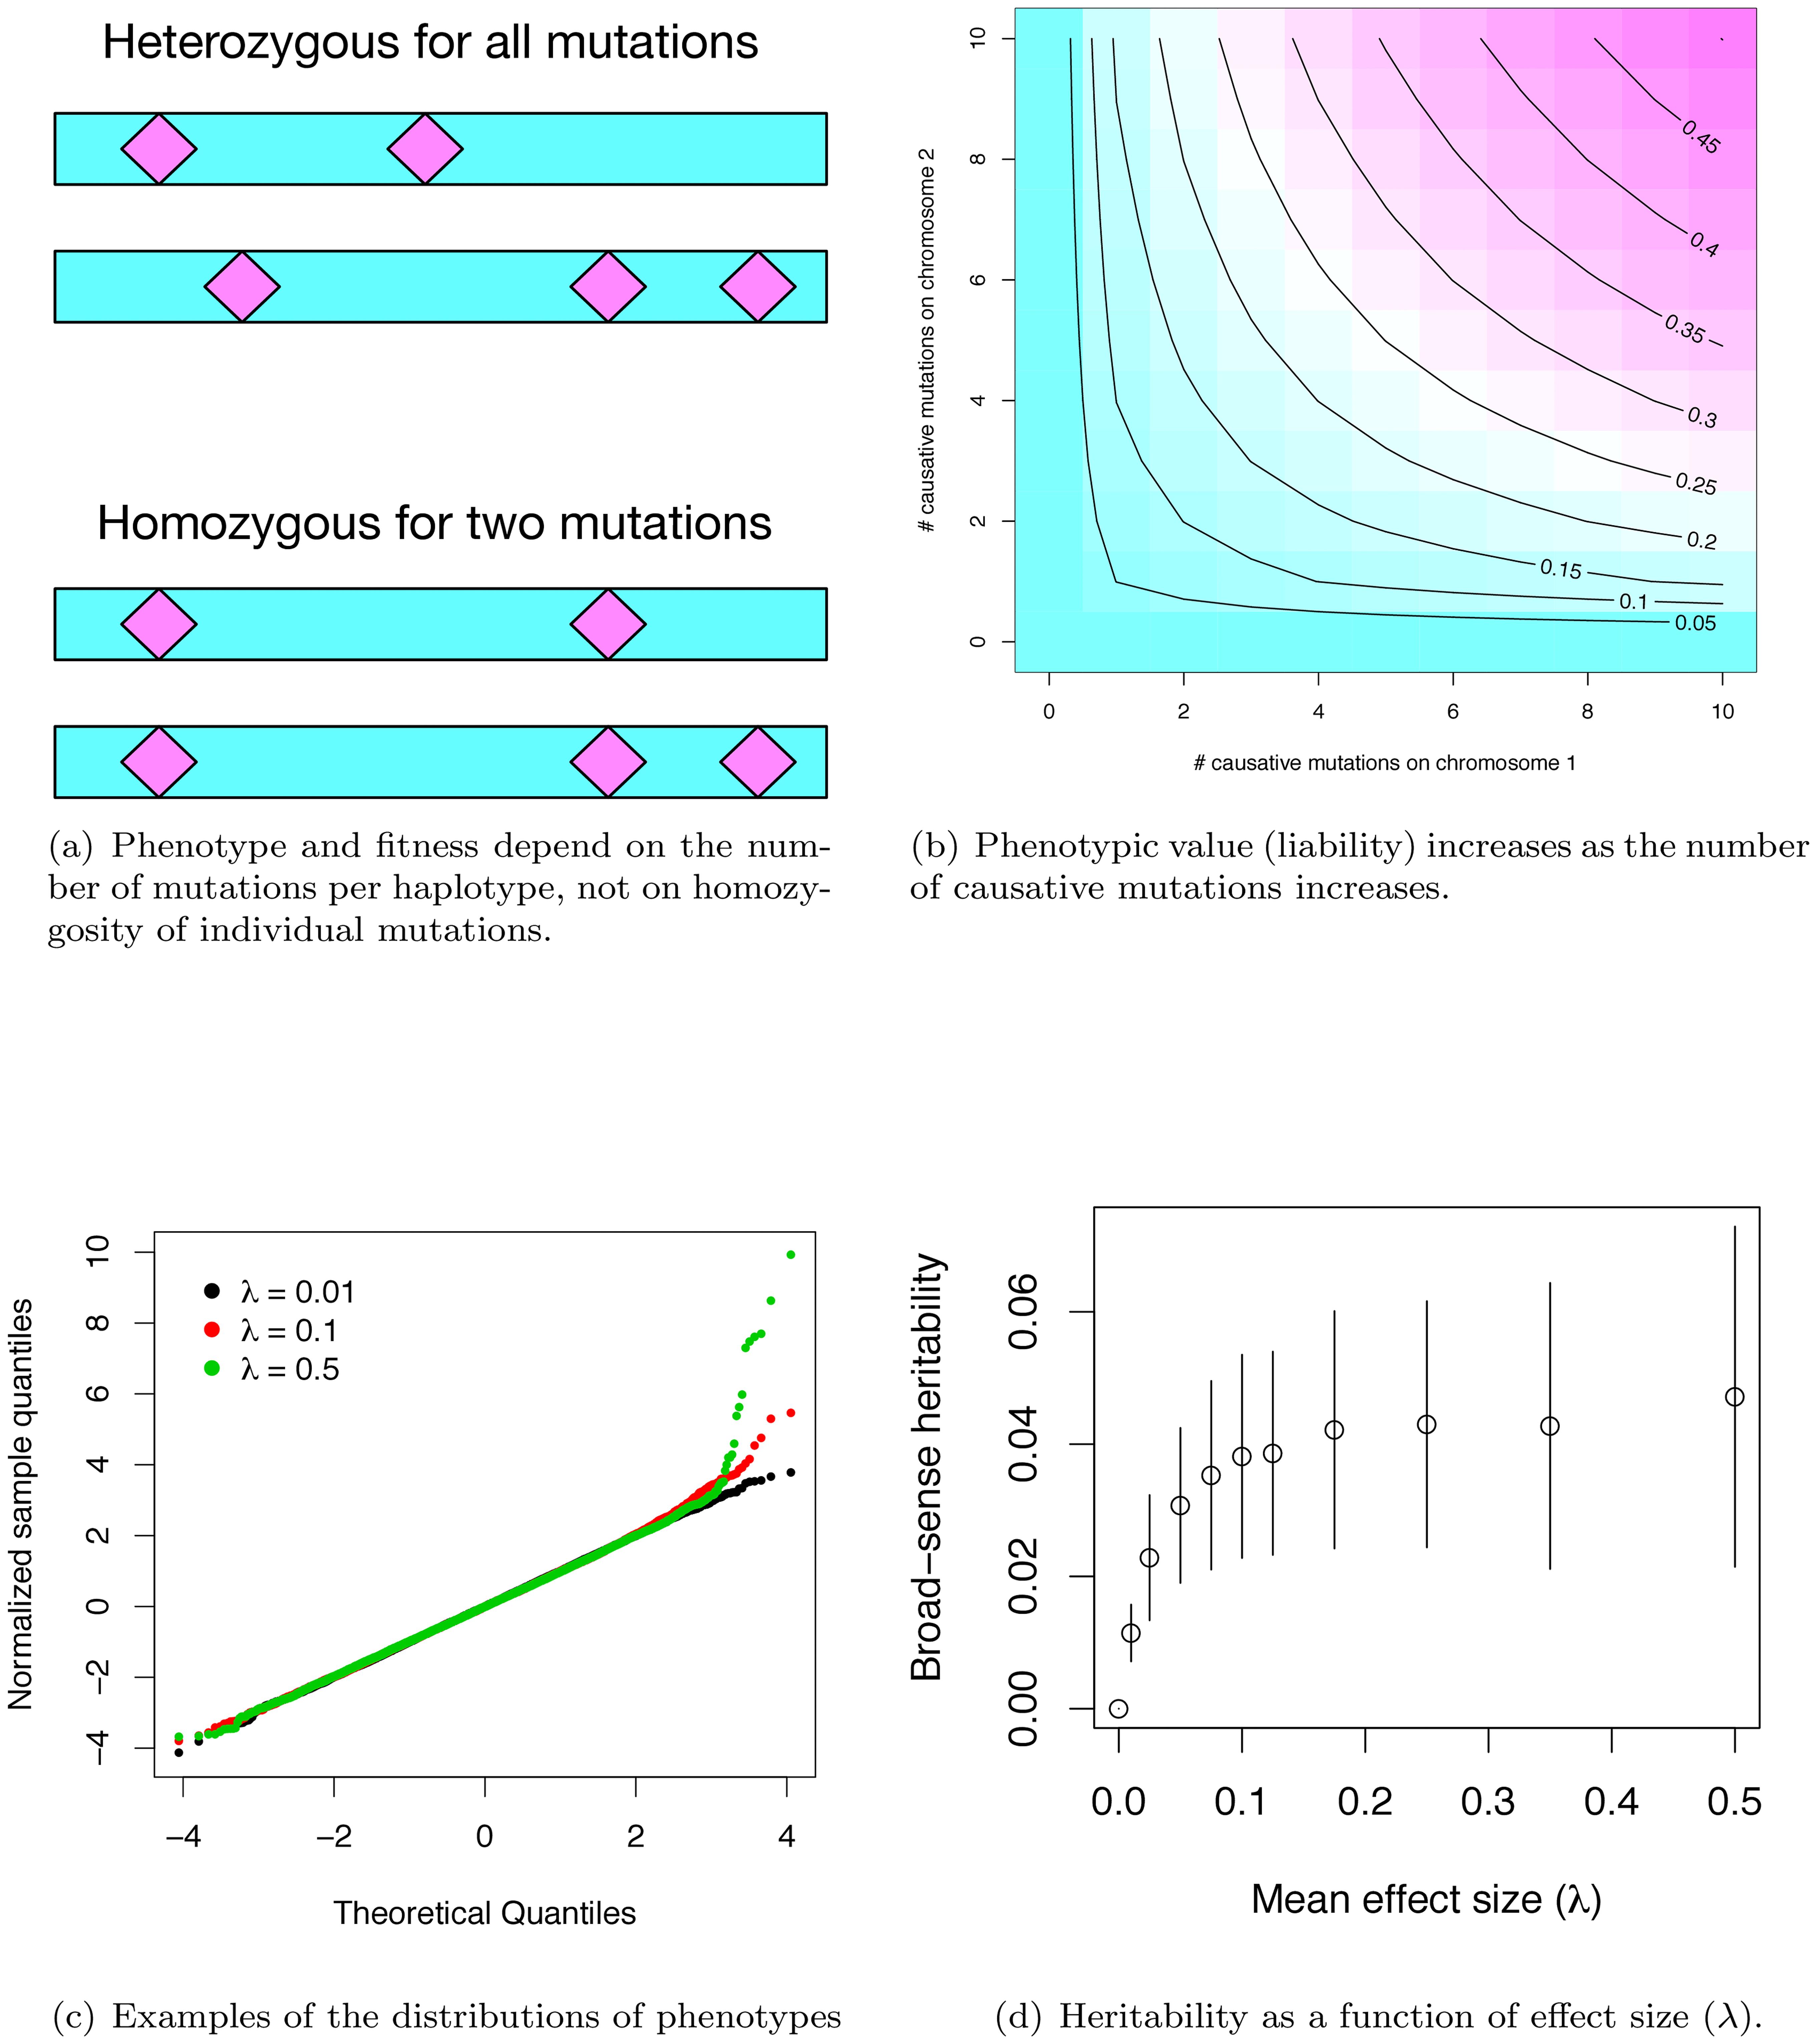 Phenotypes under the gene-based model.